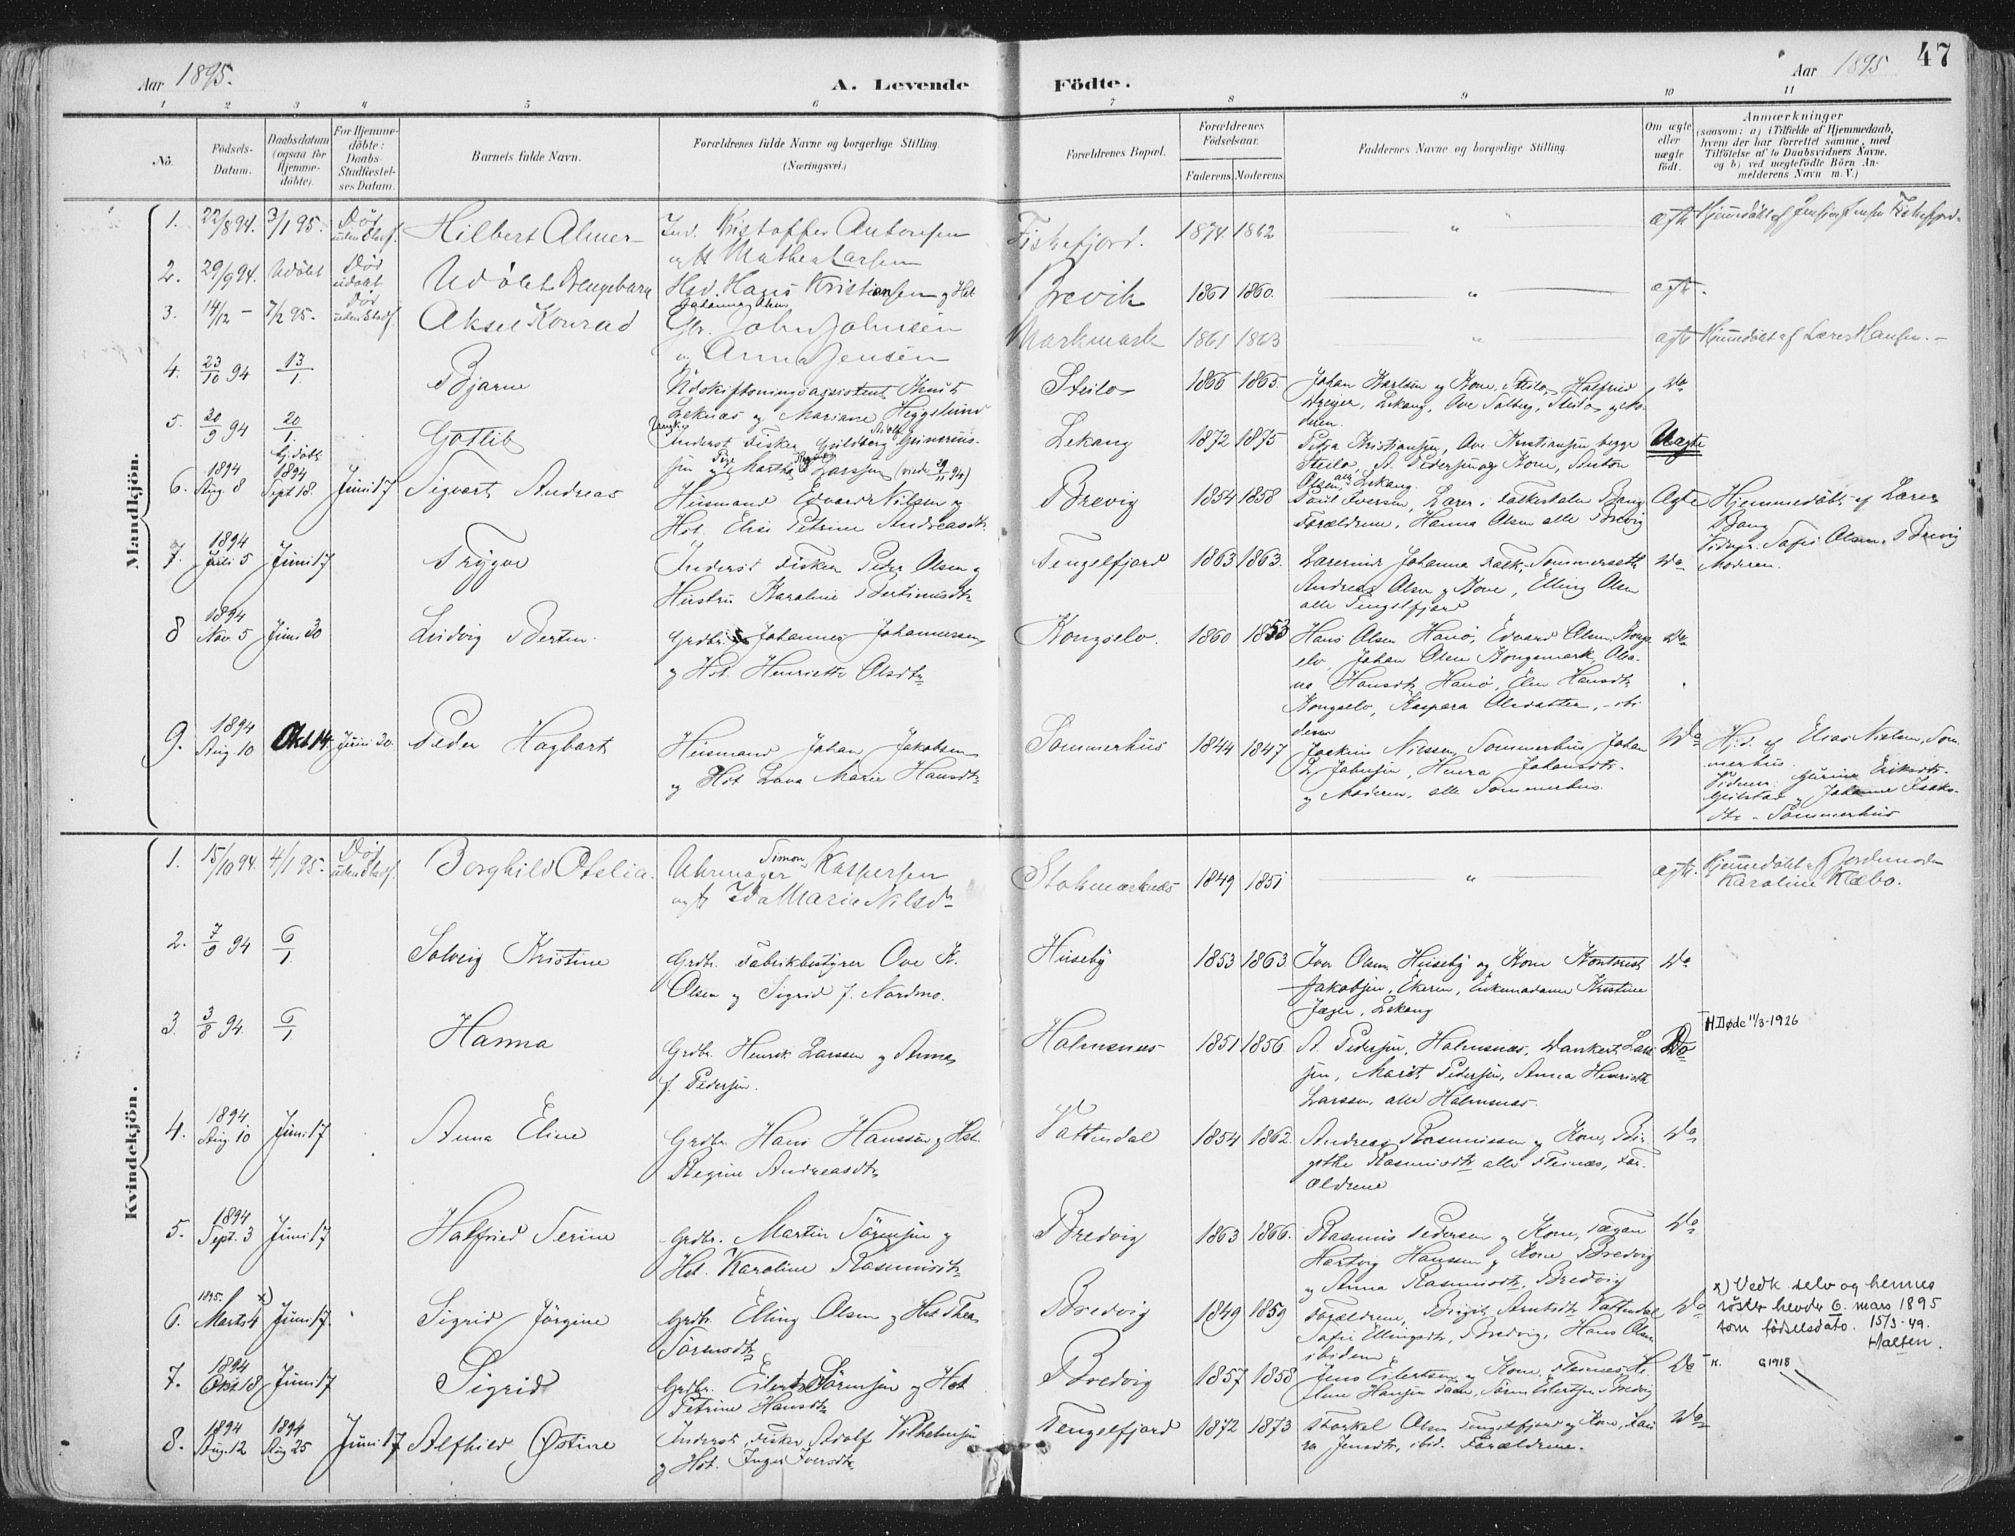 SAT, Ministerialprotokoller, klokkerbøker og fødselsregistre - Nordland, 888/L1246: Ministerialbok nr. 888A12, 1891-1903, s. 47